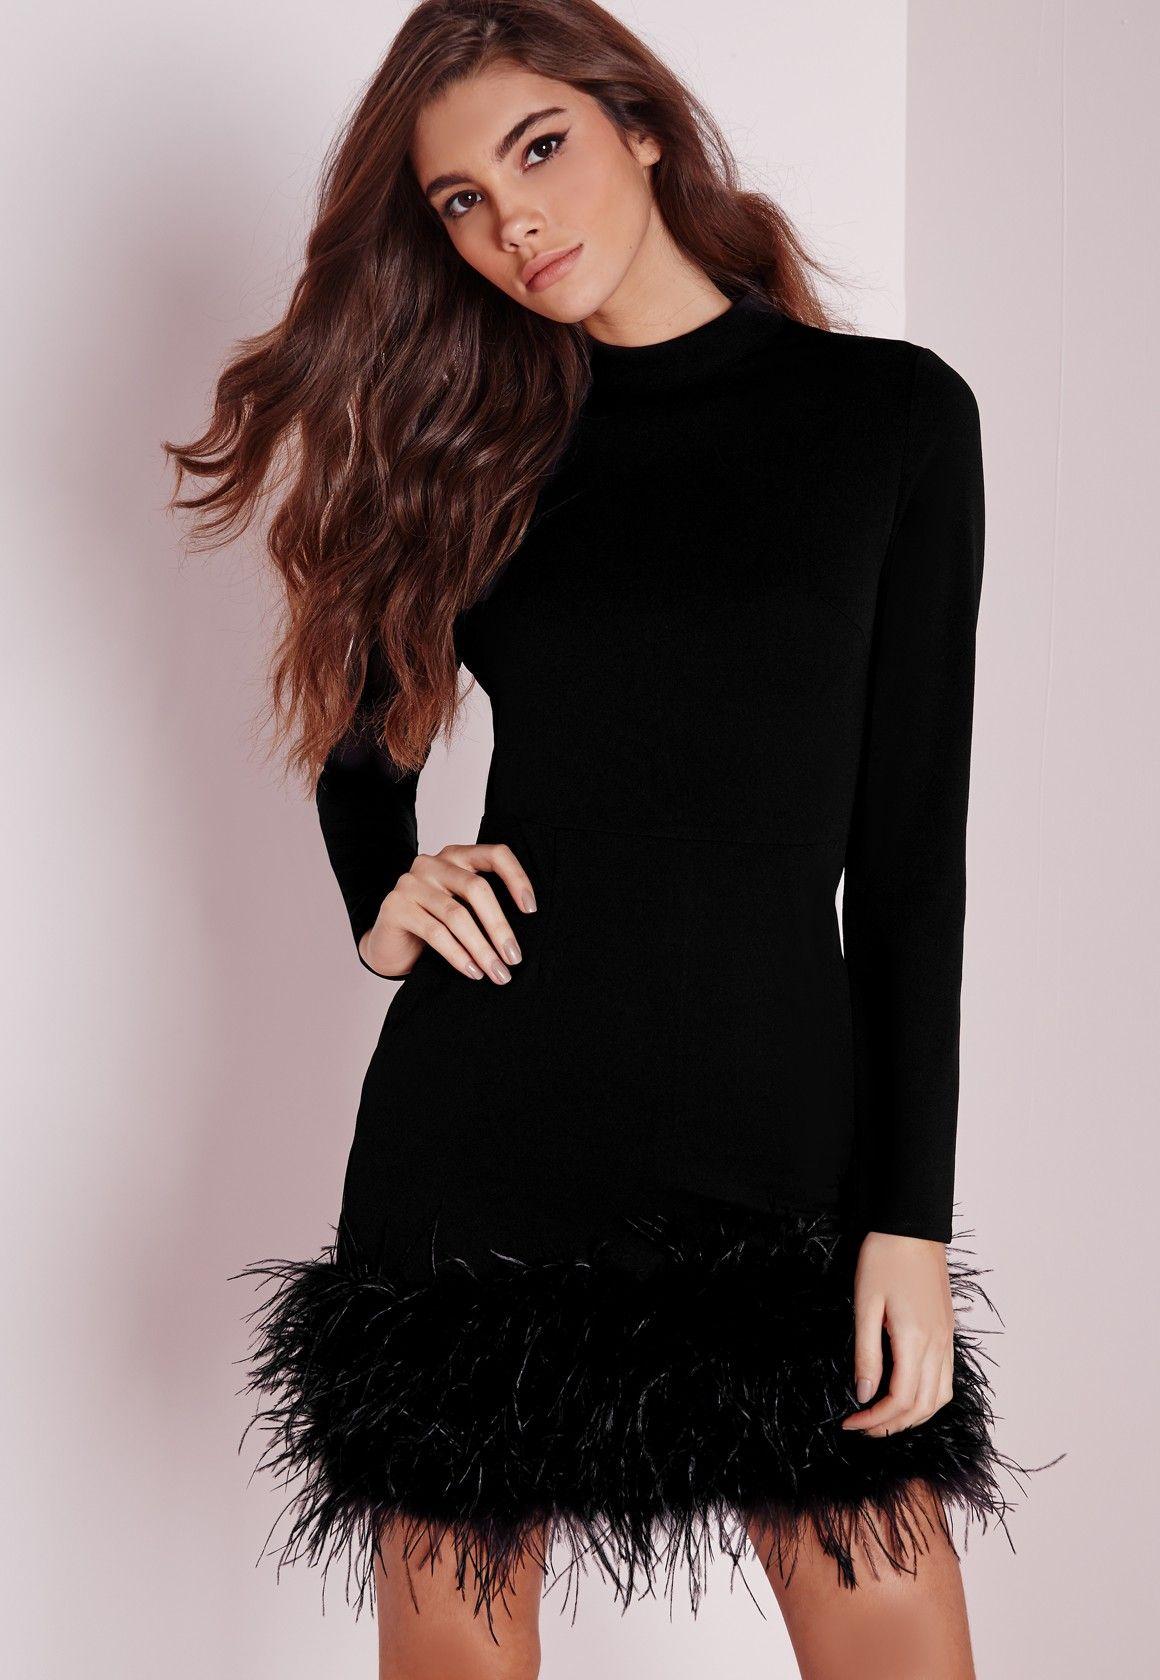 Missguided High Neck Feather Trim Bodycon Dress Black Platya [ 1680 x 1160 Pixel ]